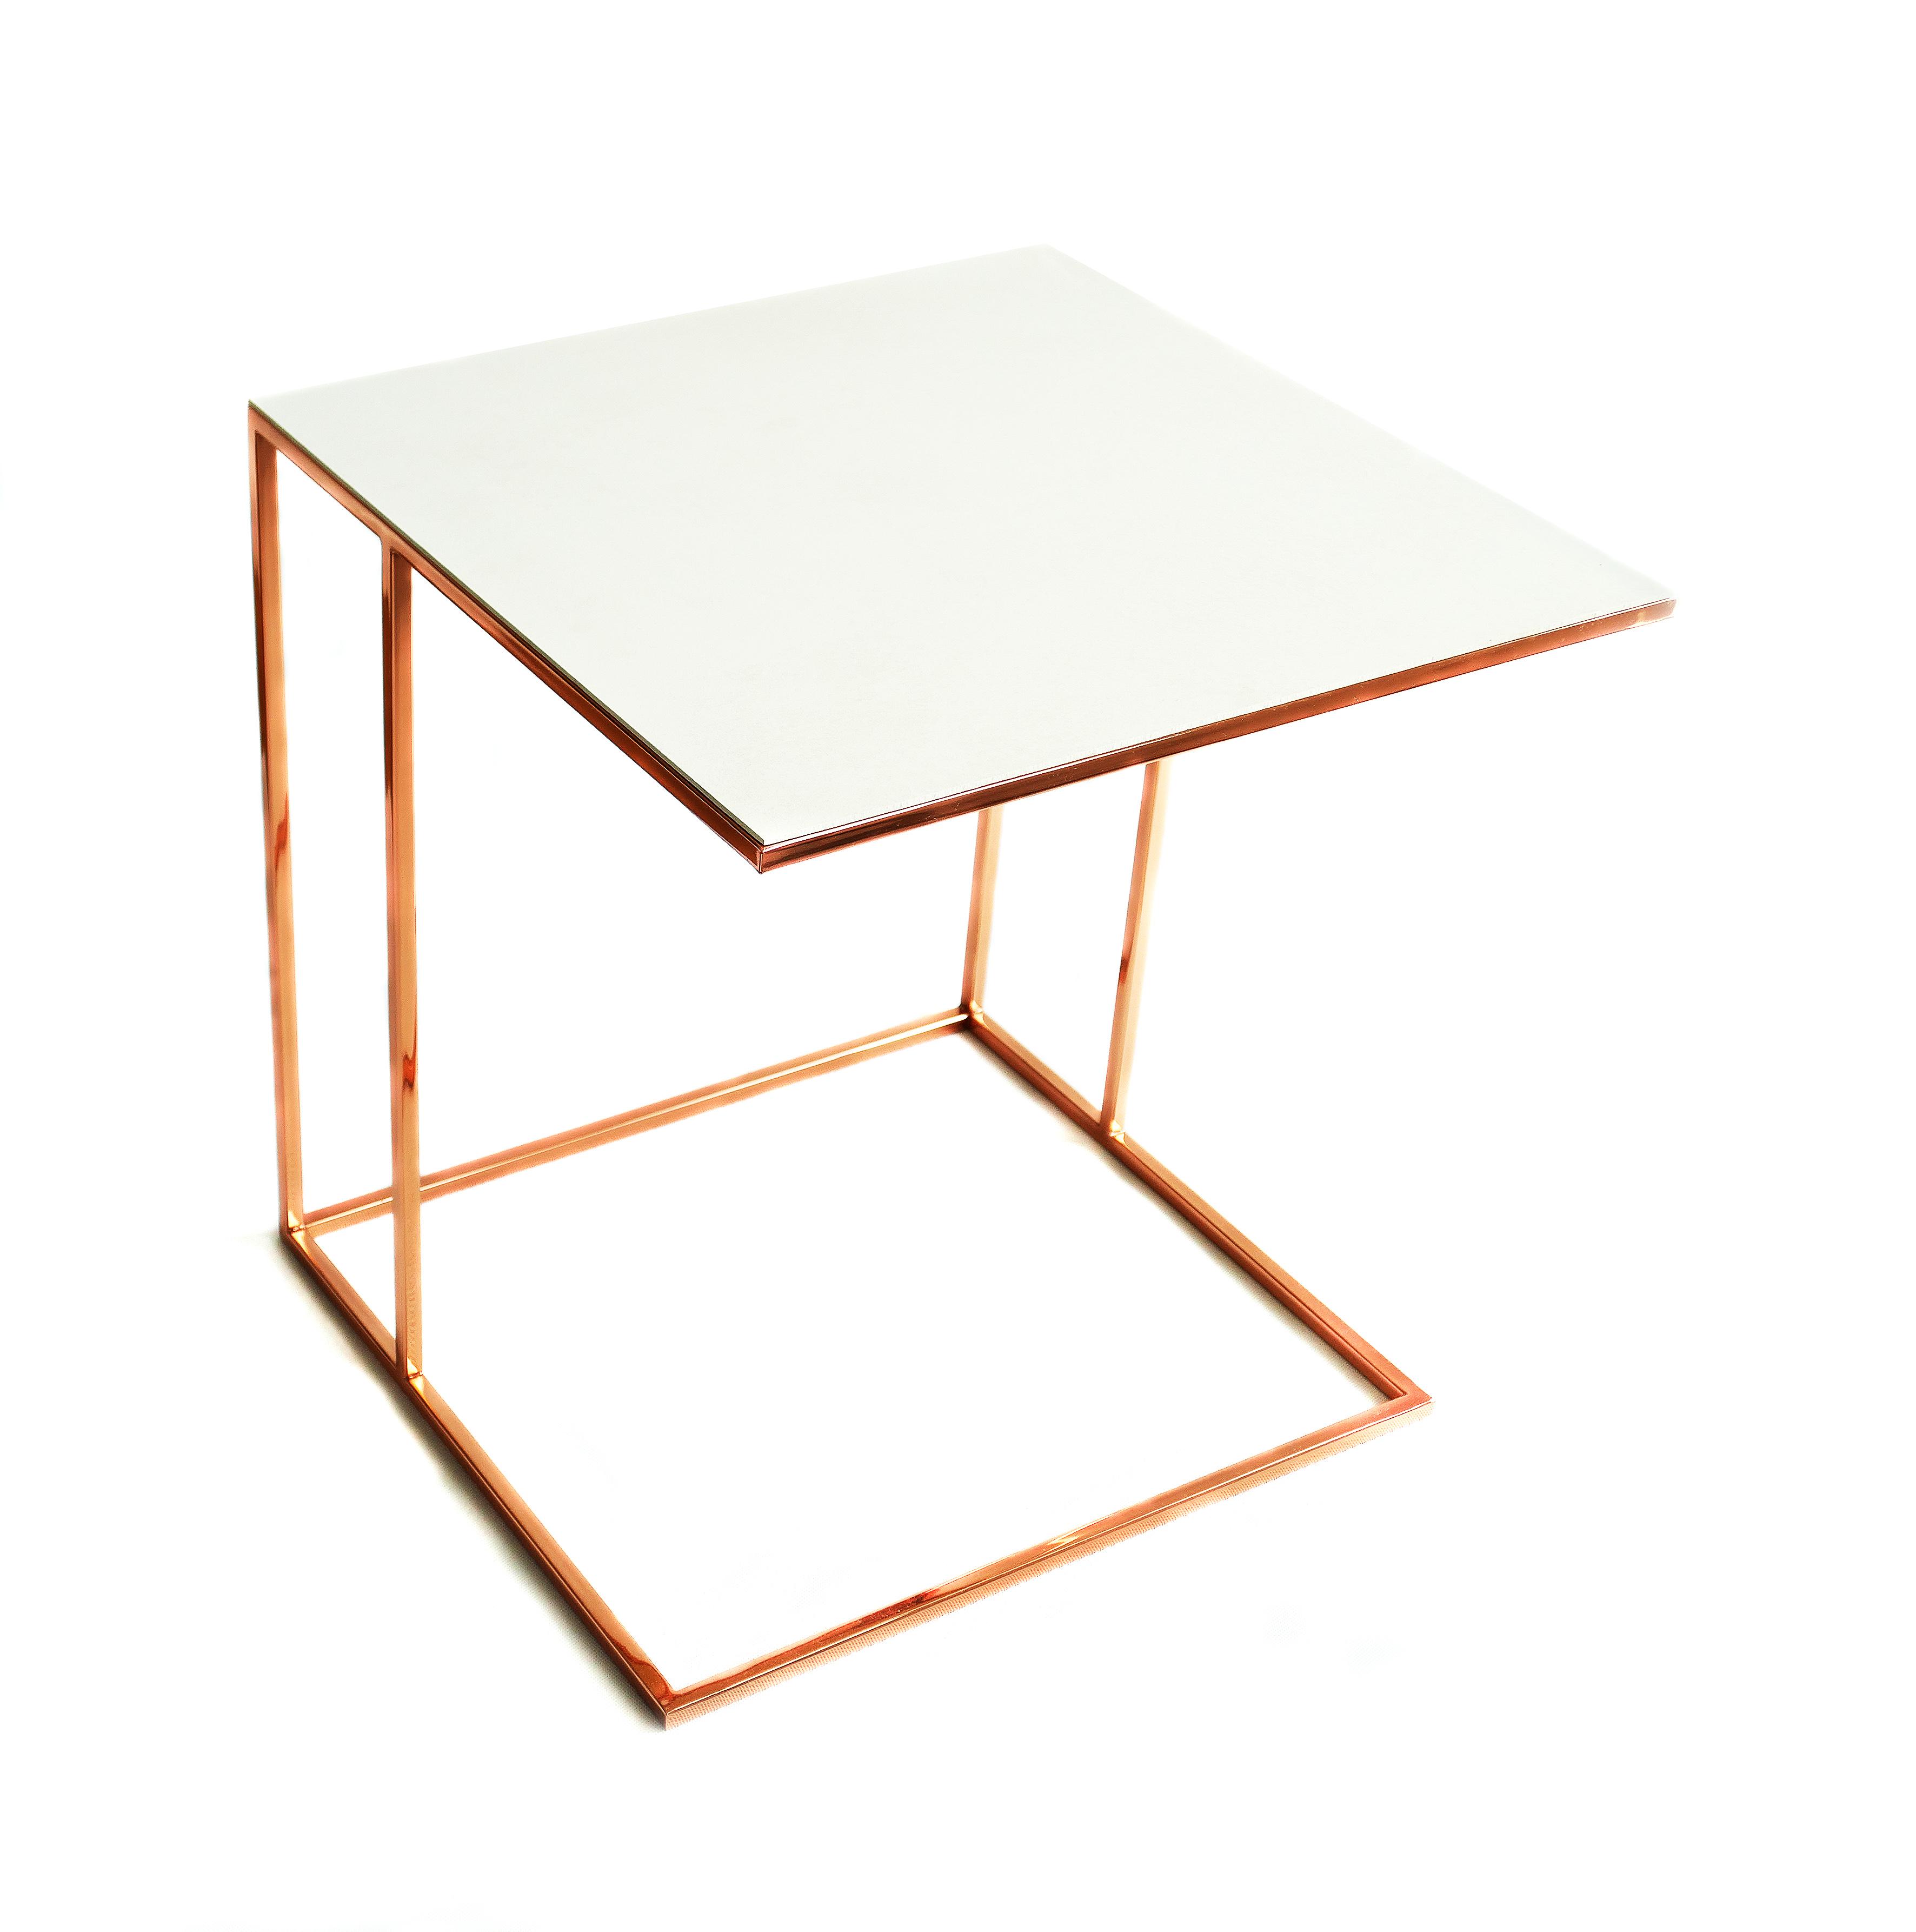 Stolik nadstawka REA furniture ALICUDI – rama RAME/ blat Laminam OXIDE BIANCO – wymiary 50/50/53